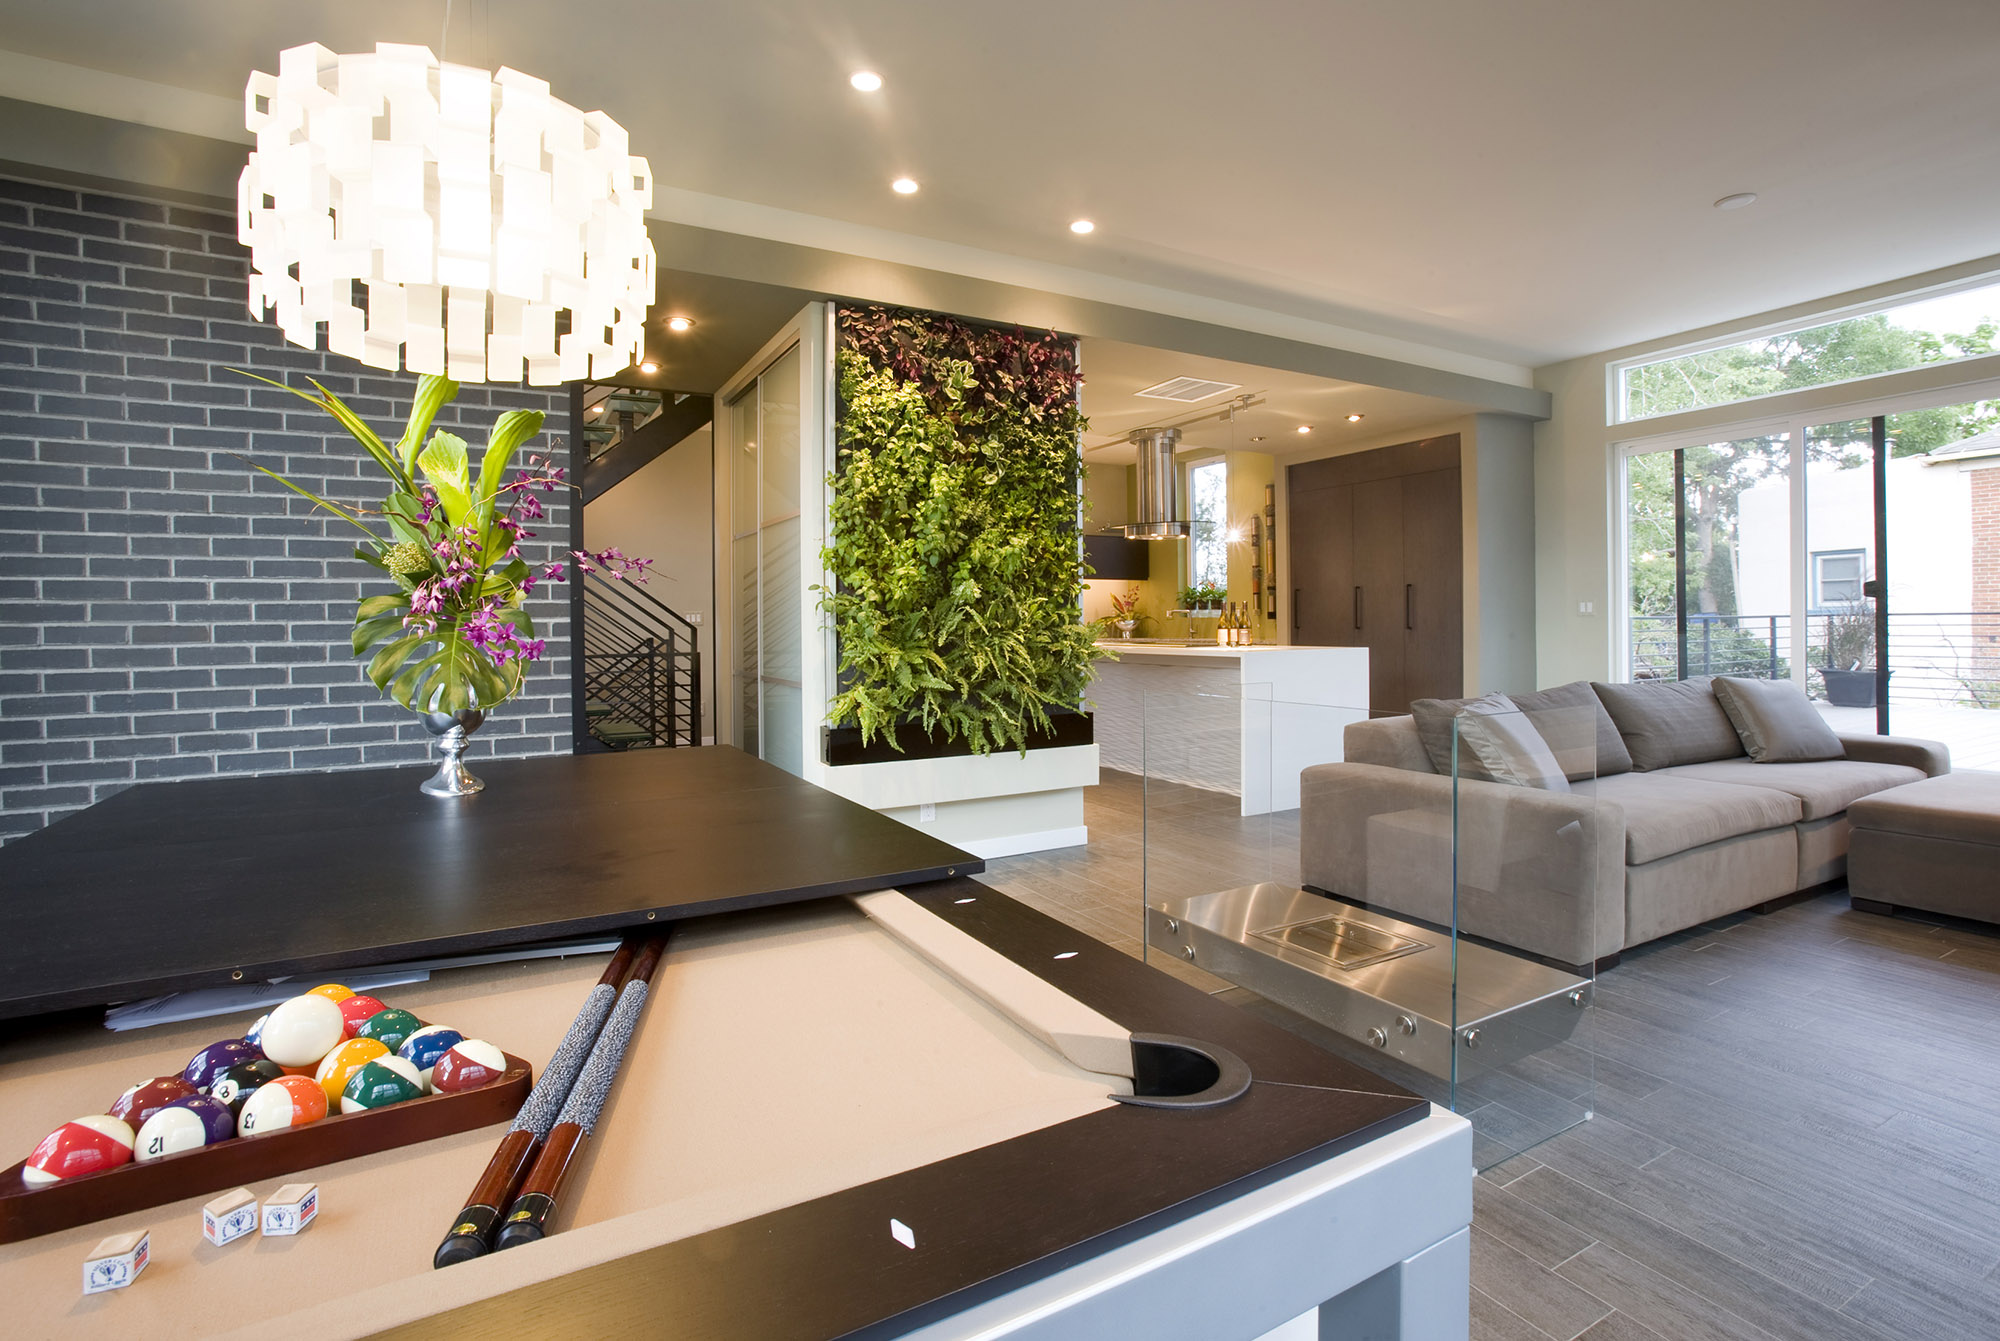 wall-green-room-interior